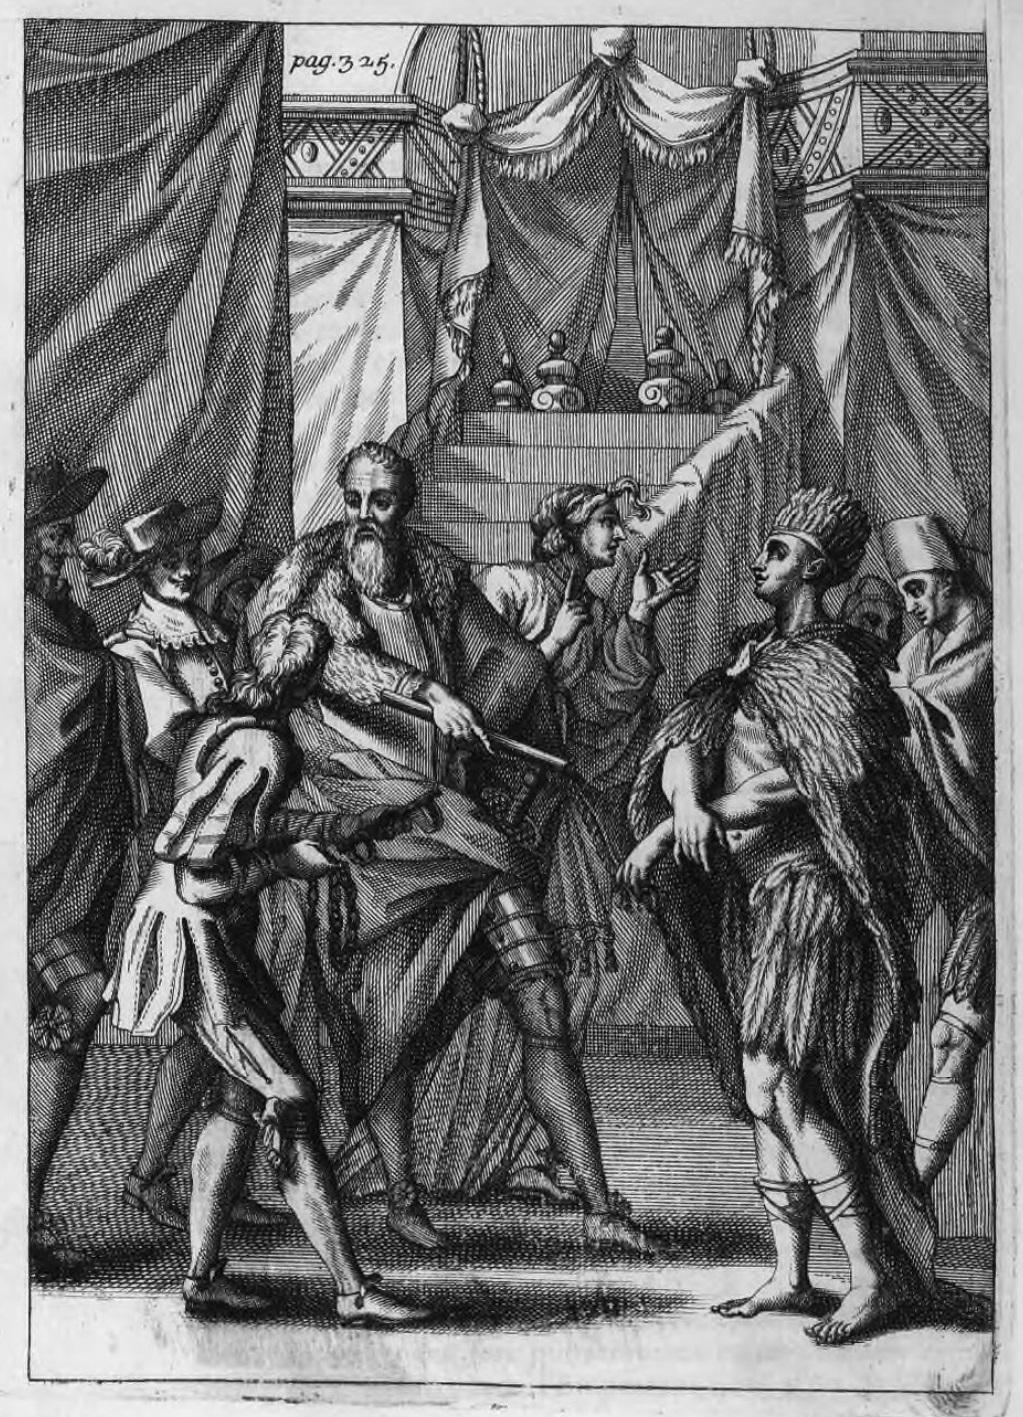 Filevan Beecq Moctezuma Imprisoned By Cortésjpeg Wikimedia Commons